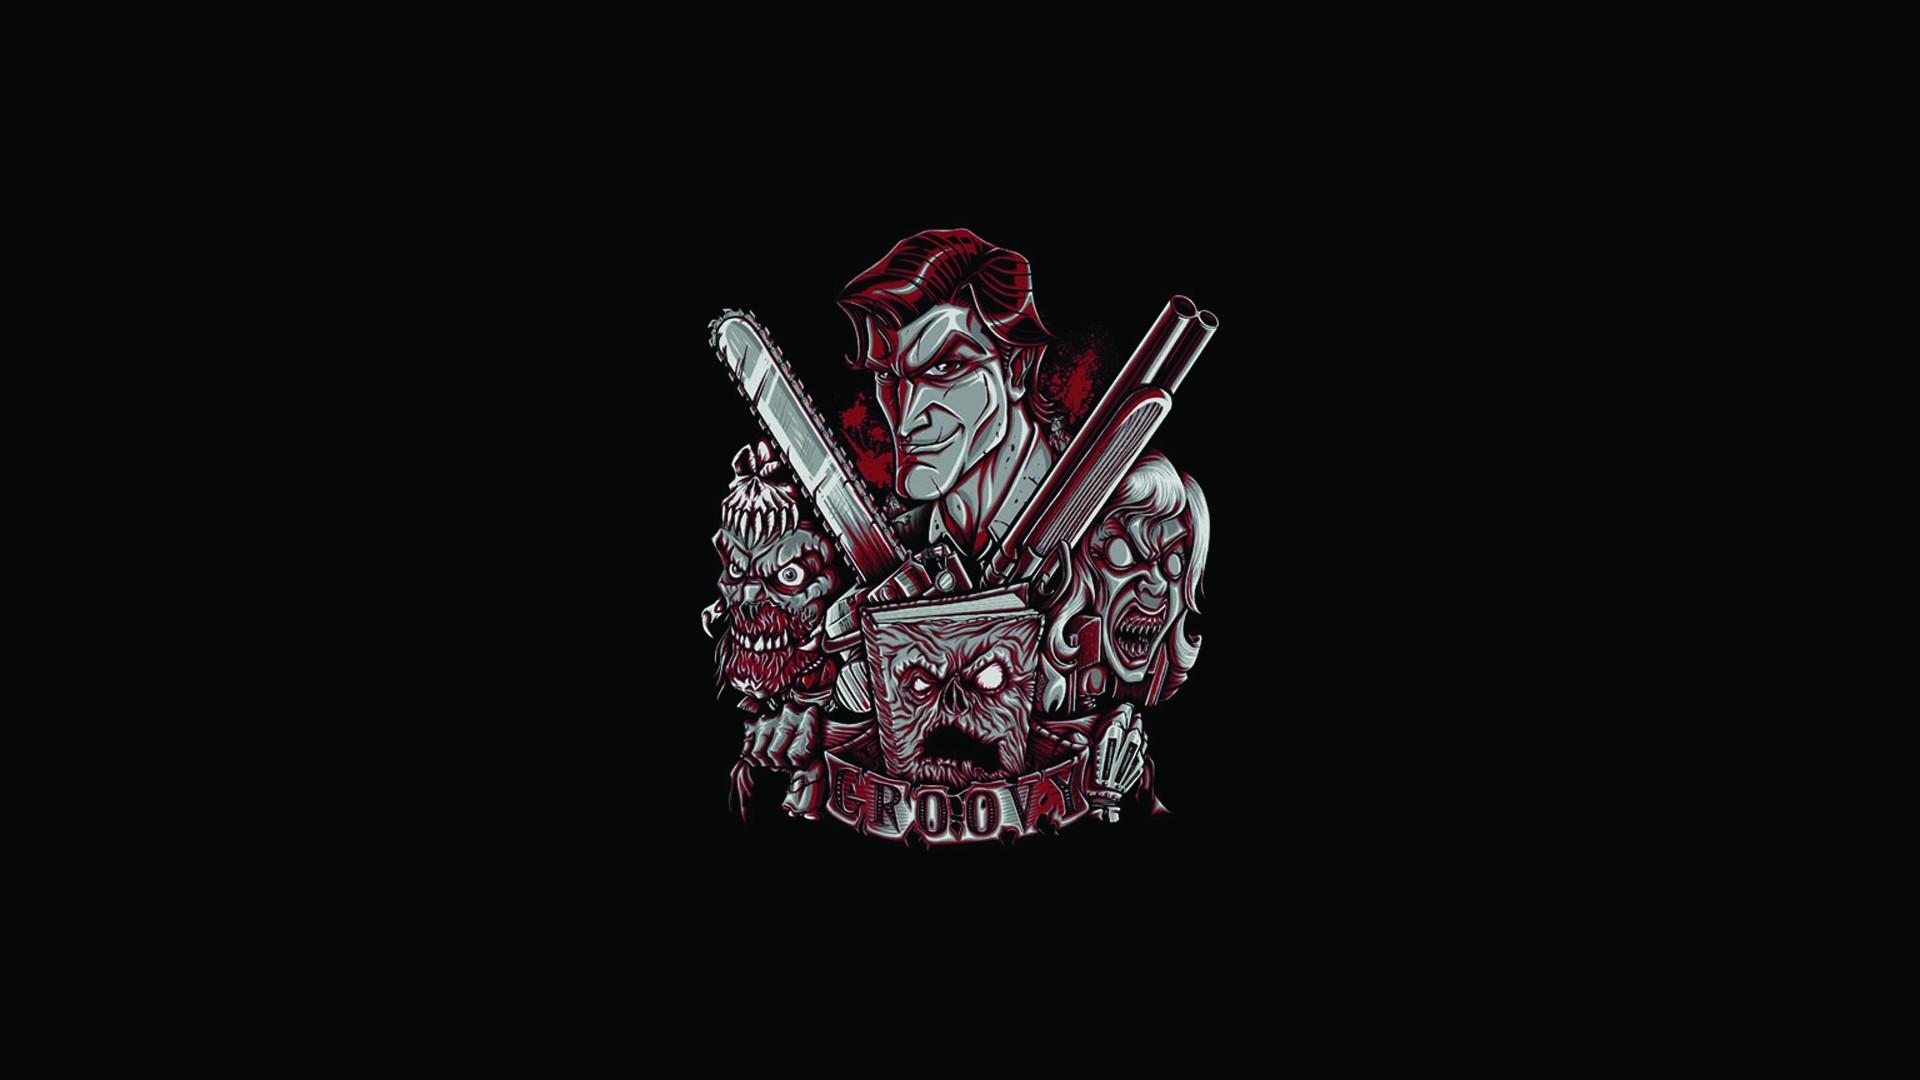 Evil Dead Black Army Of Darkness Dark Zombie Wallpaper At Dark Wallpapers